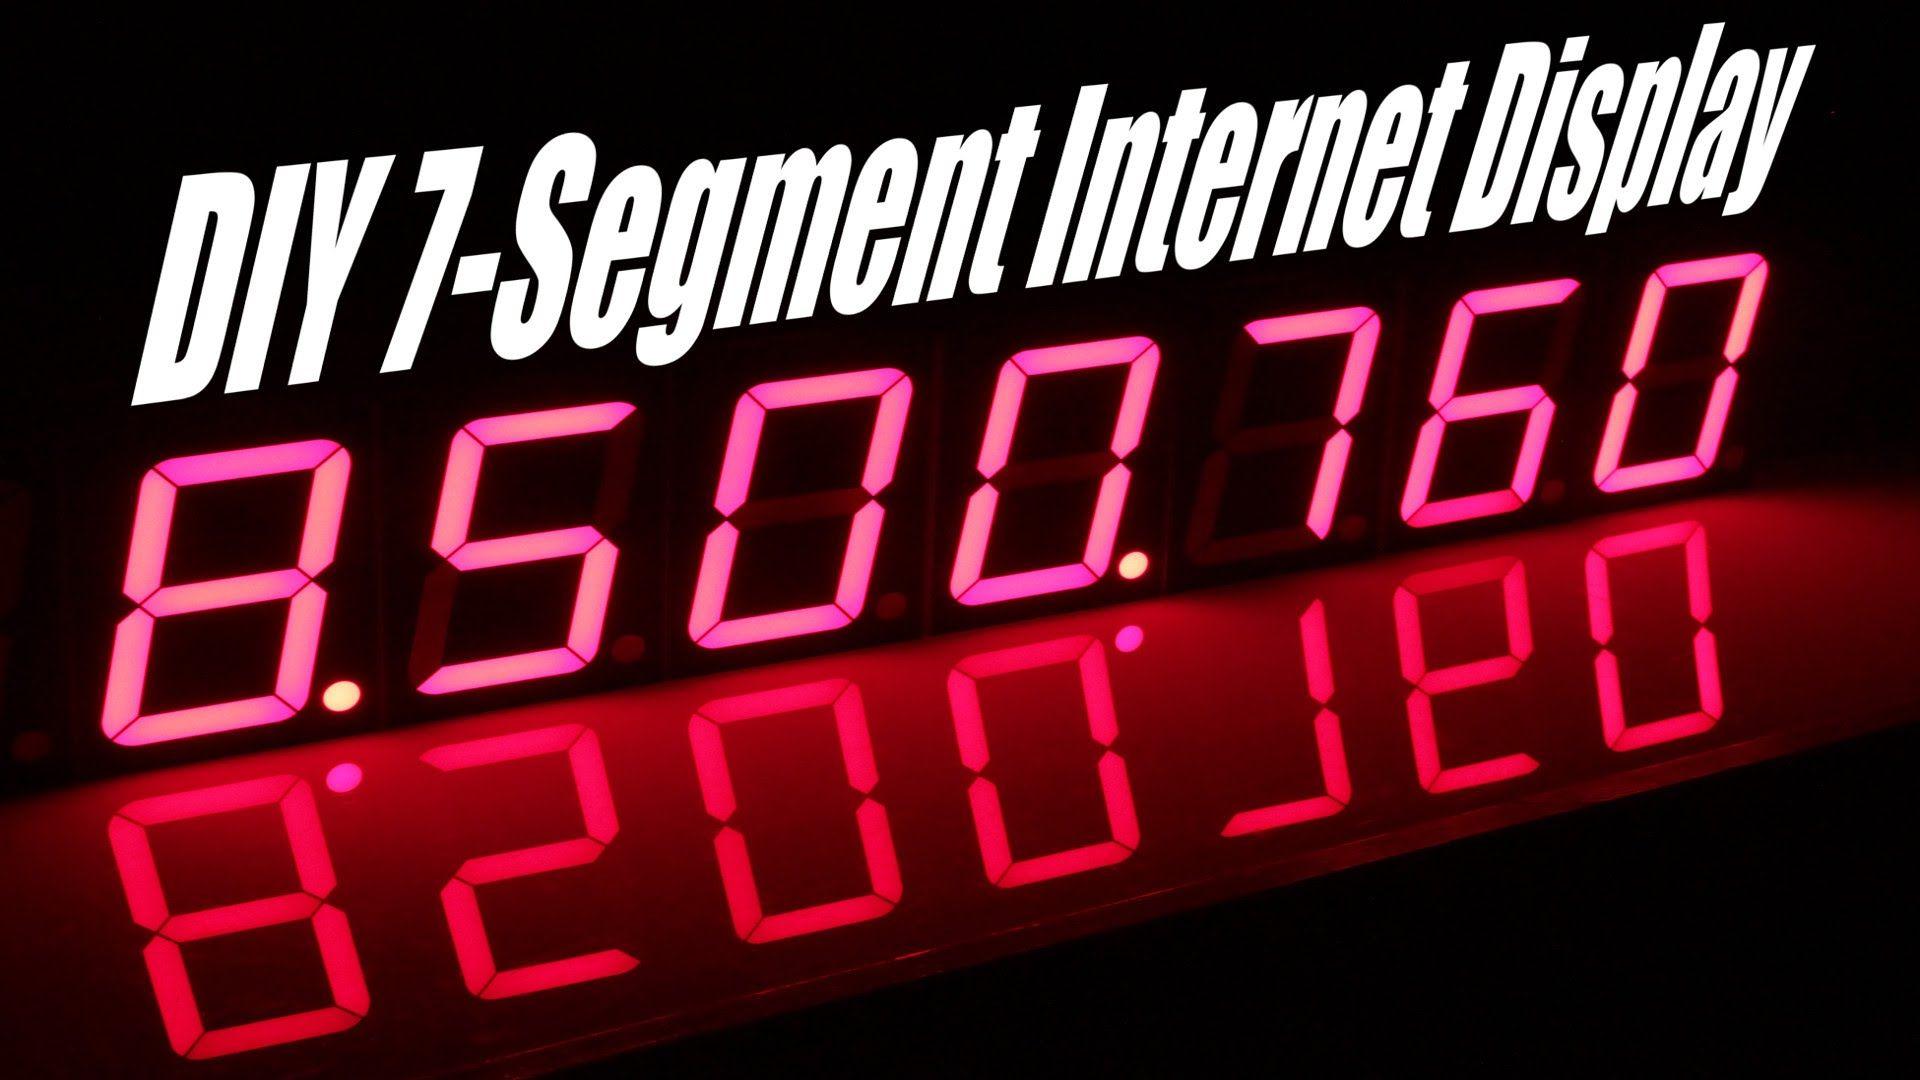 Seven Segment Display With Data Via Web Mcu Esp8266 Raspberry And Tutorials Digital Systems Part 4 Decoder For 7segment